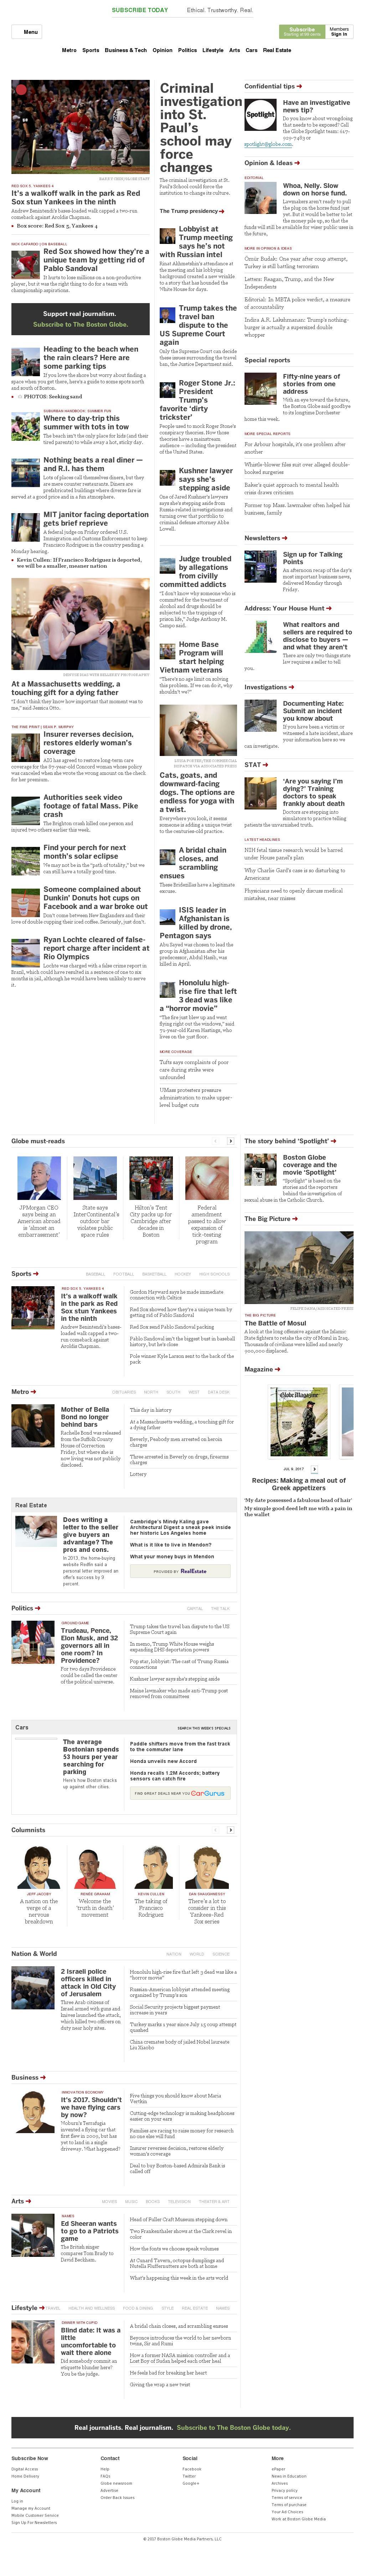 The Boston Globe at Saturday July 15, 2017, 1:02 p.m. UTC